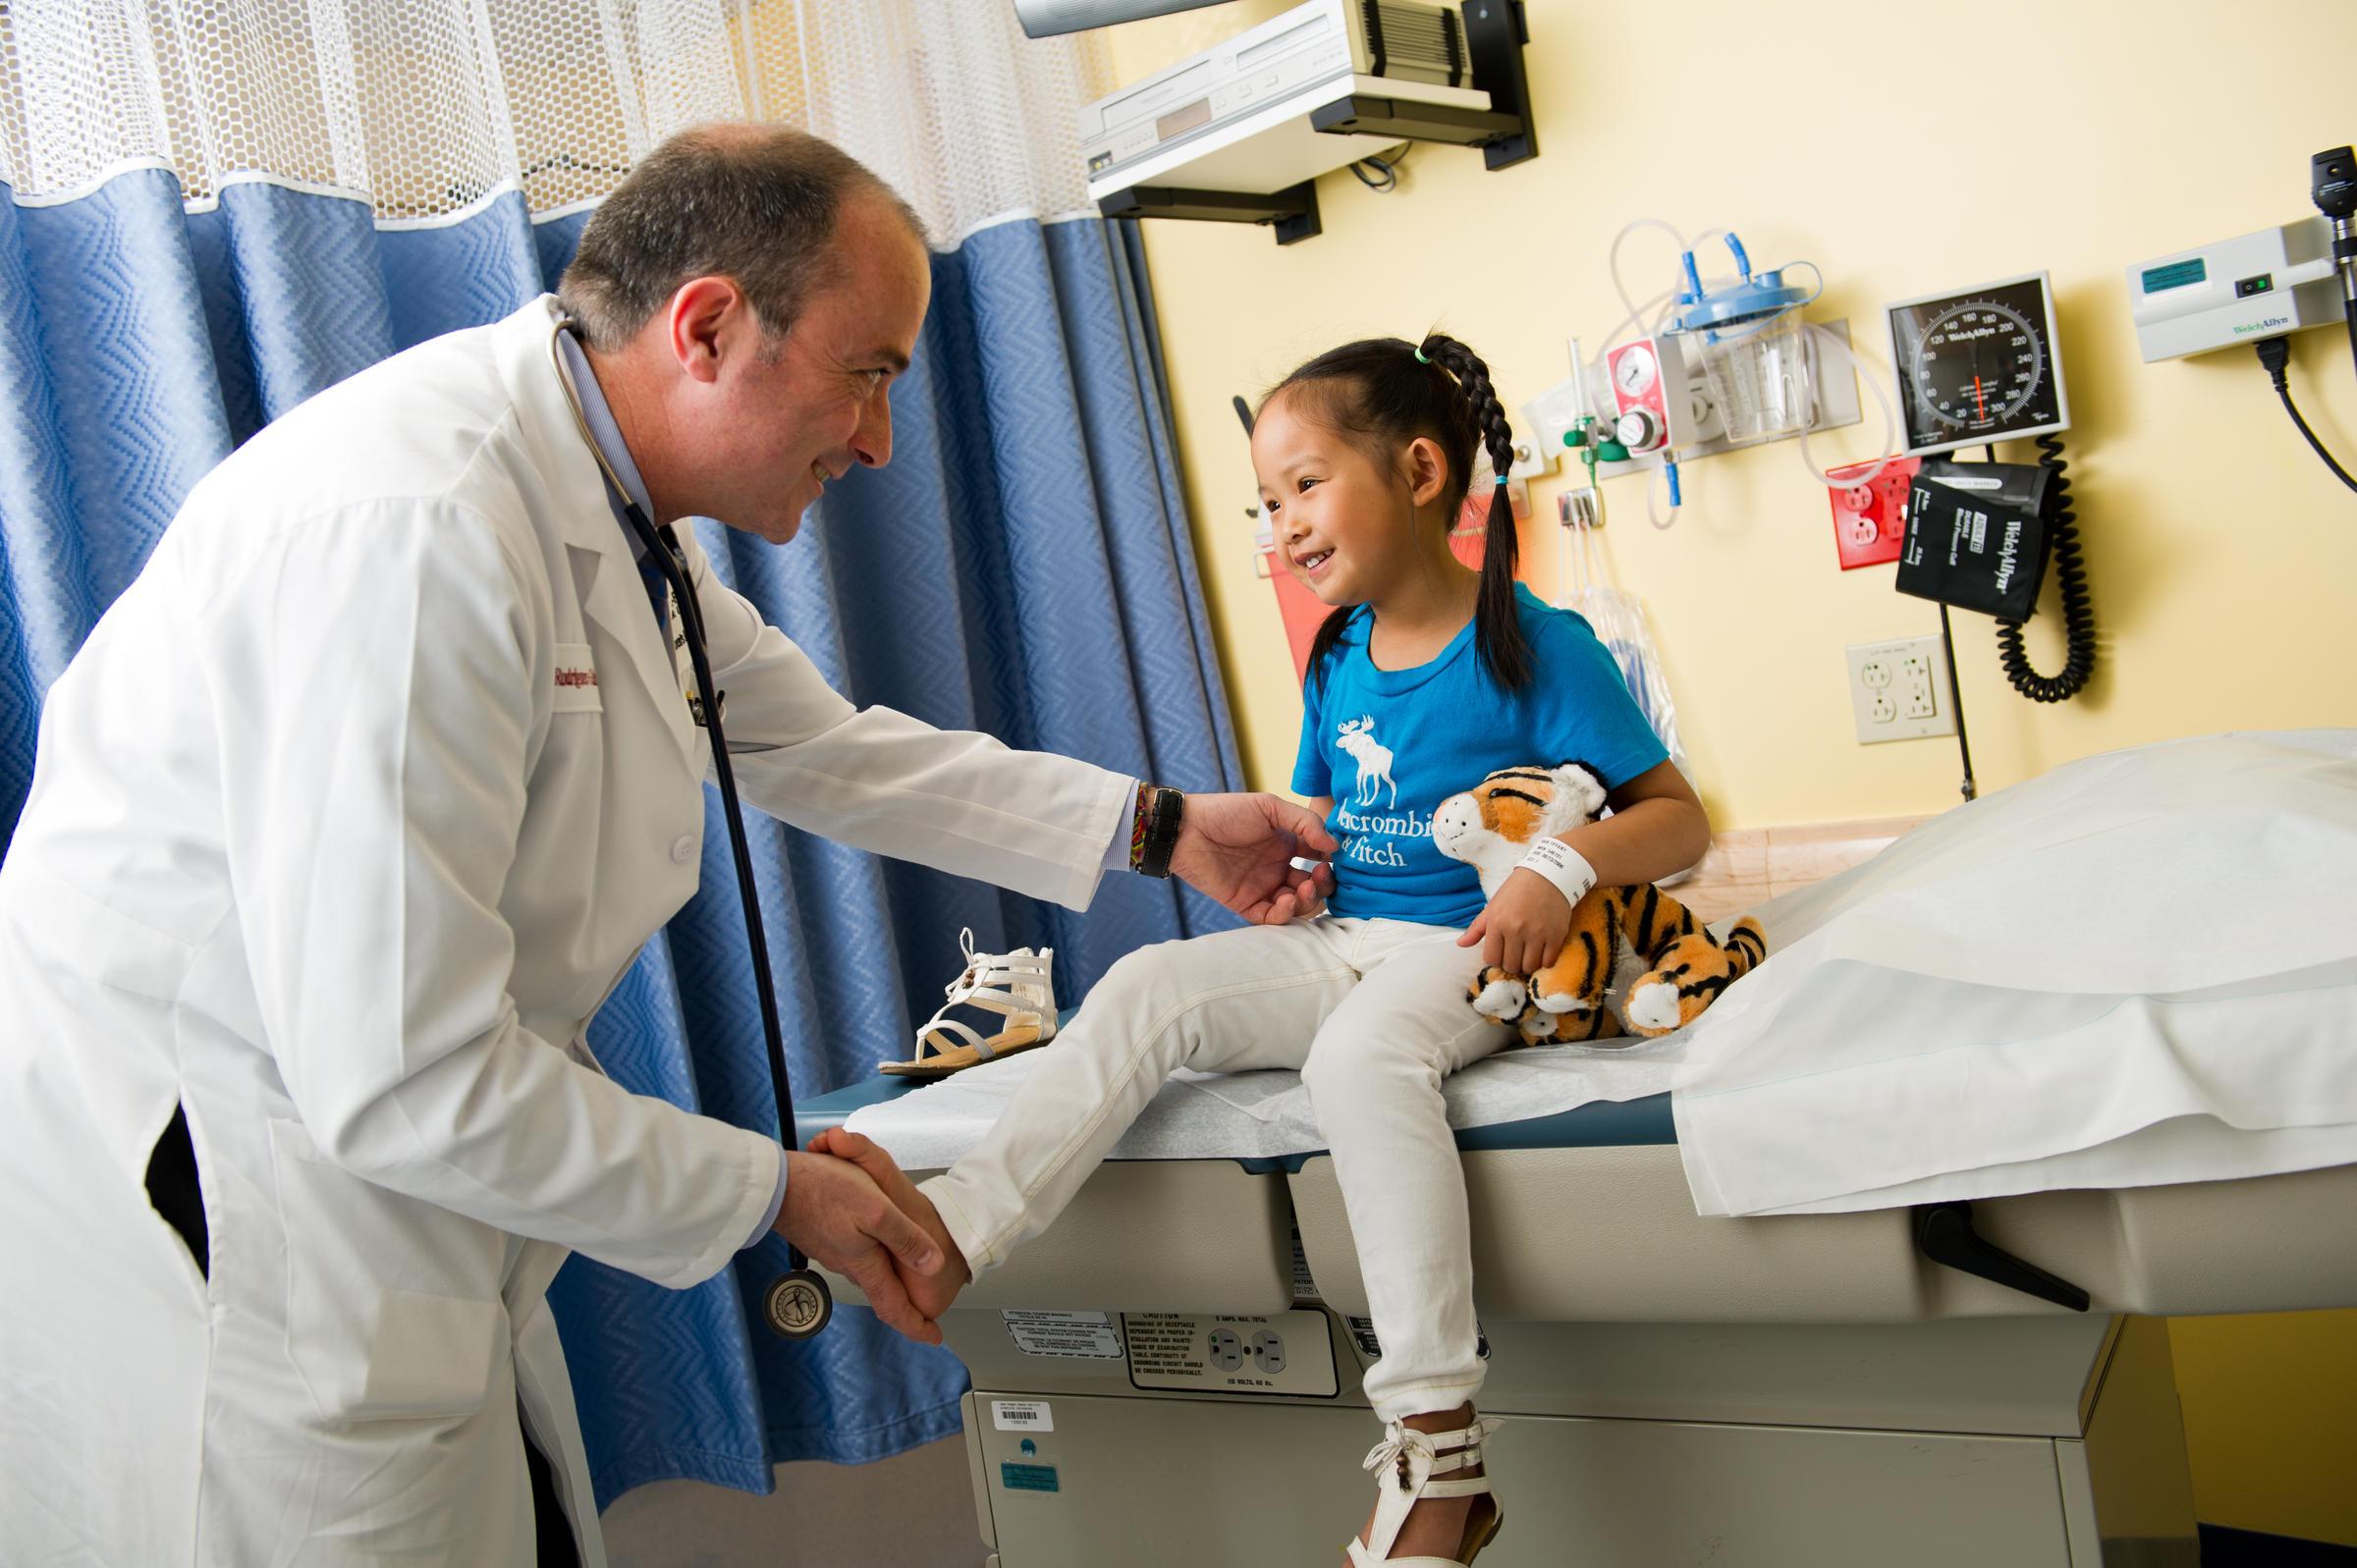 children's hospital and clinics Europe ranking world rank instituto  russian children's hospital moscow: 3241: 1114: 2898: 14: 80: 251  (hospital geral de santo antonio) 675.